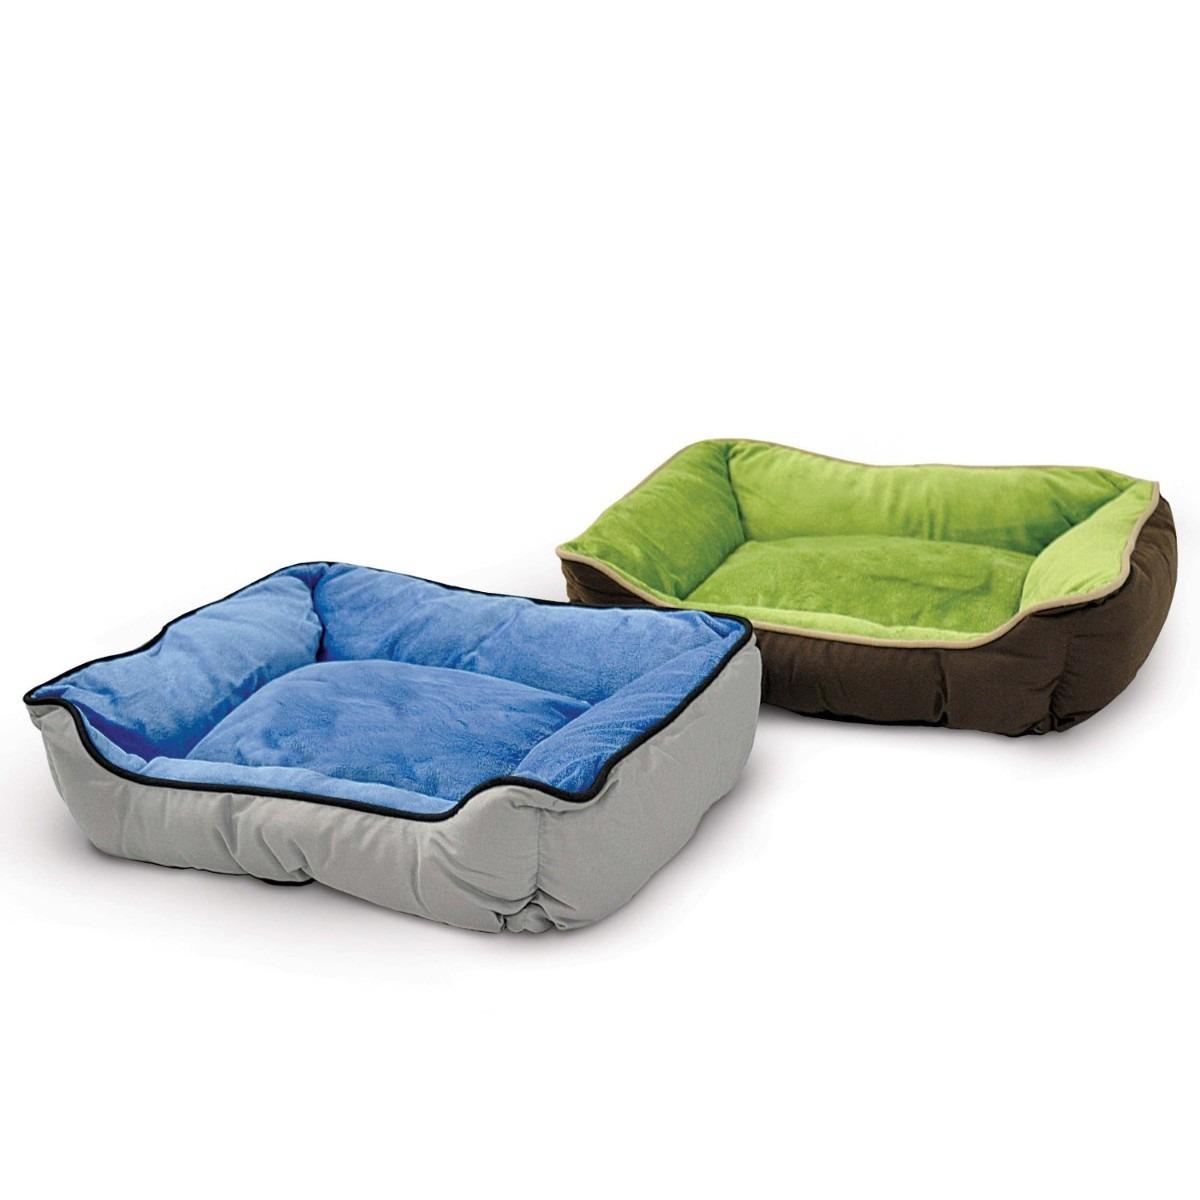 cama sofa para perros mercadolibre ashley furniture sofas and loveseats mascotas gatos animales vv4 1 099 00